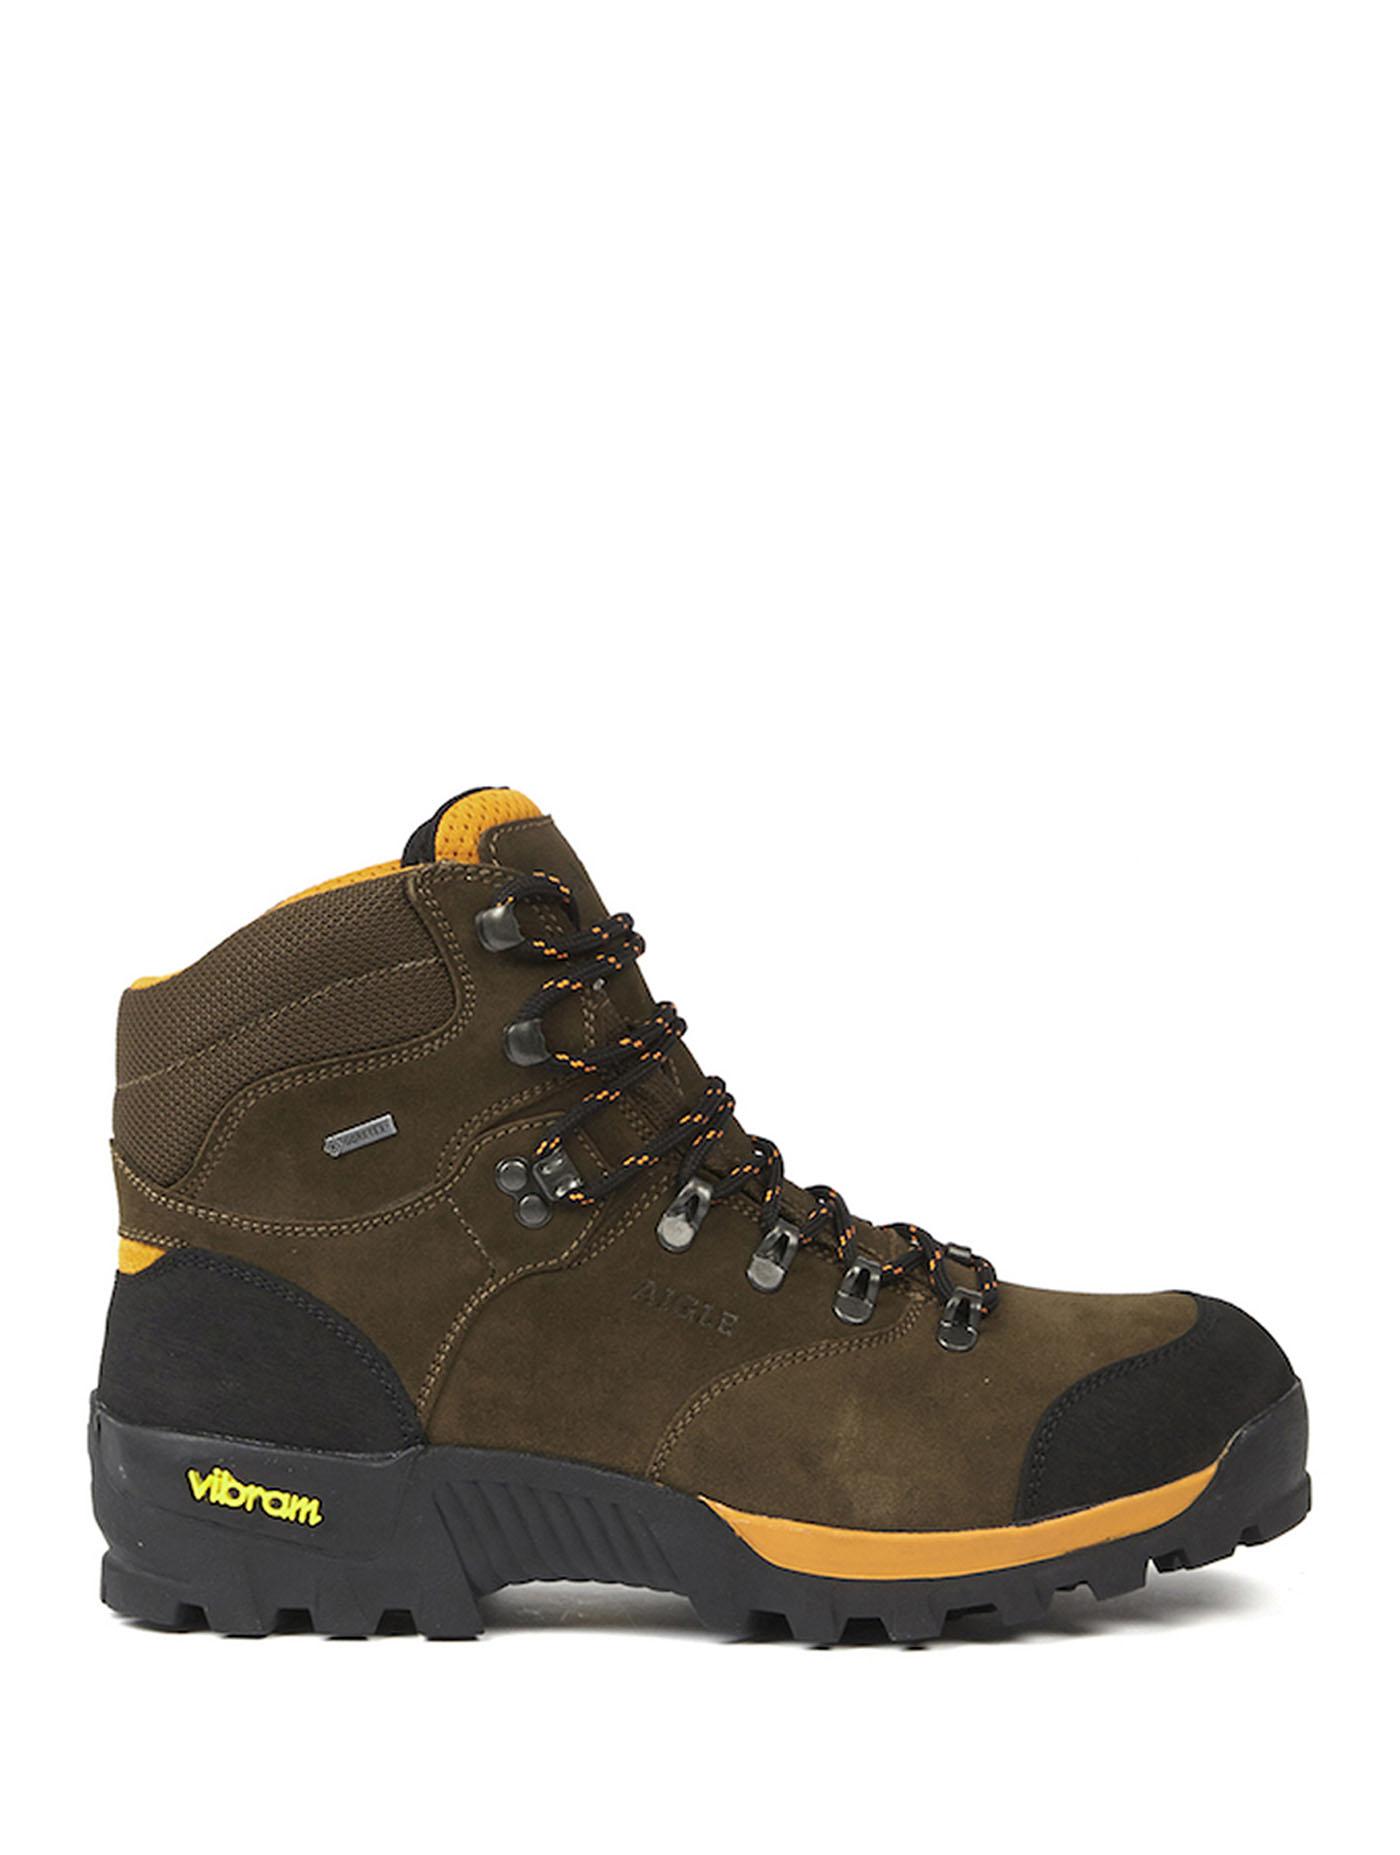 82201f06f6f ALTAVIO MID GORE-TEX | Men's waterproof hunting shoes Sepia ...